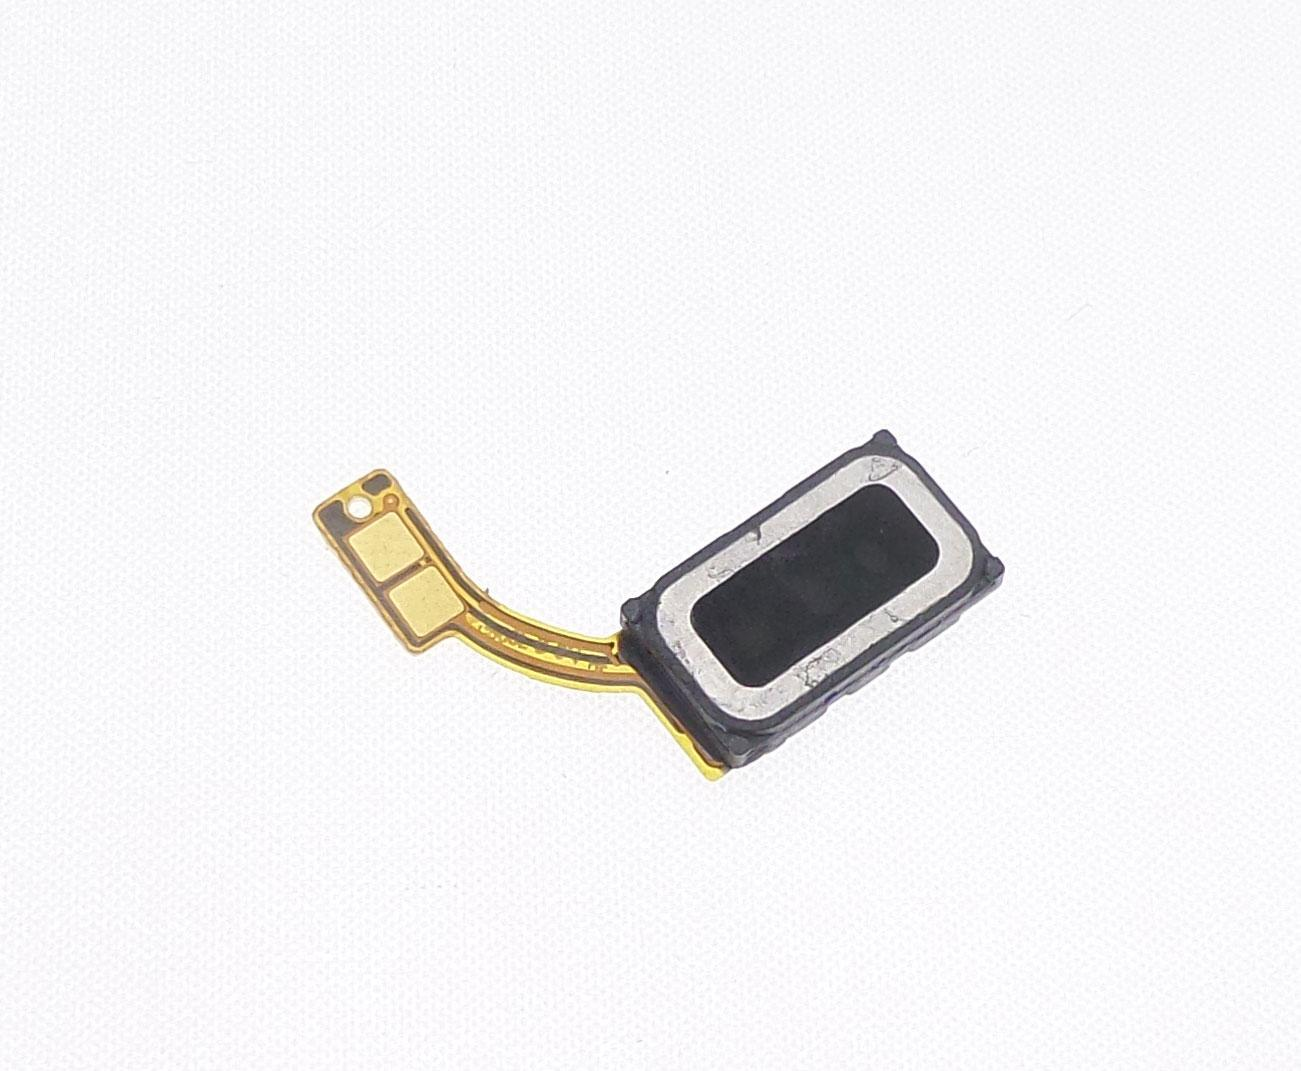 Haut parleur oreille conversation pour Samsung Galaxy S5 SM-G900F G900A